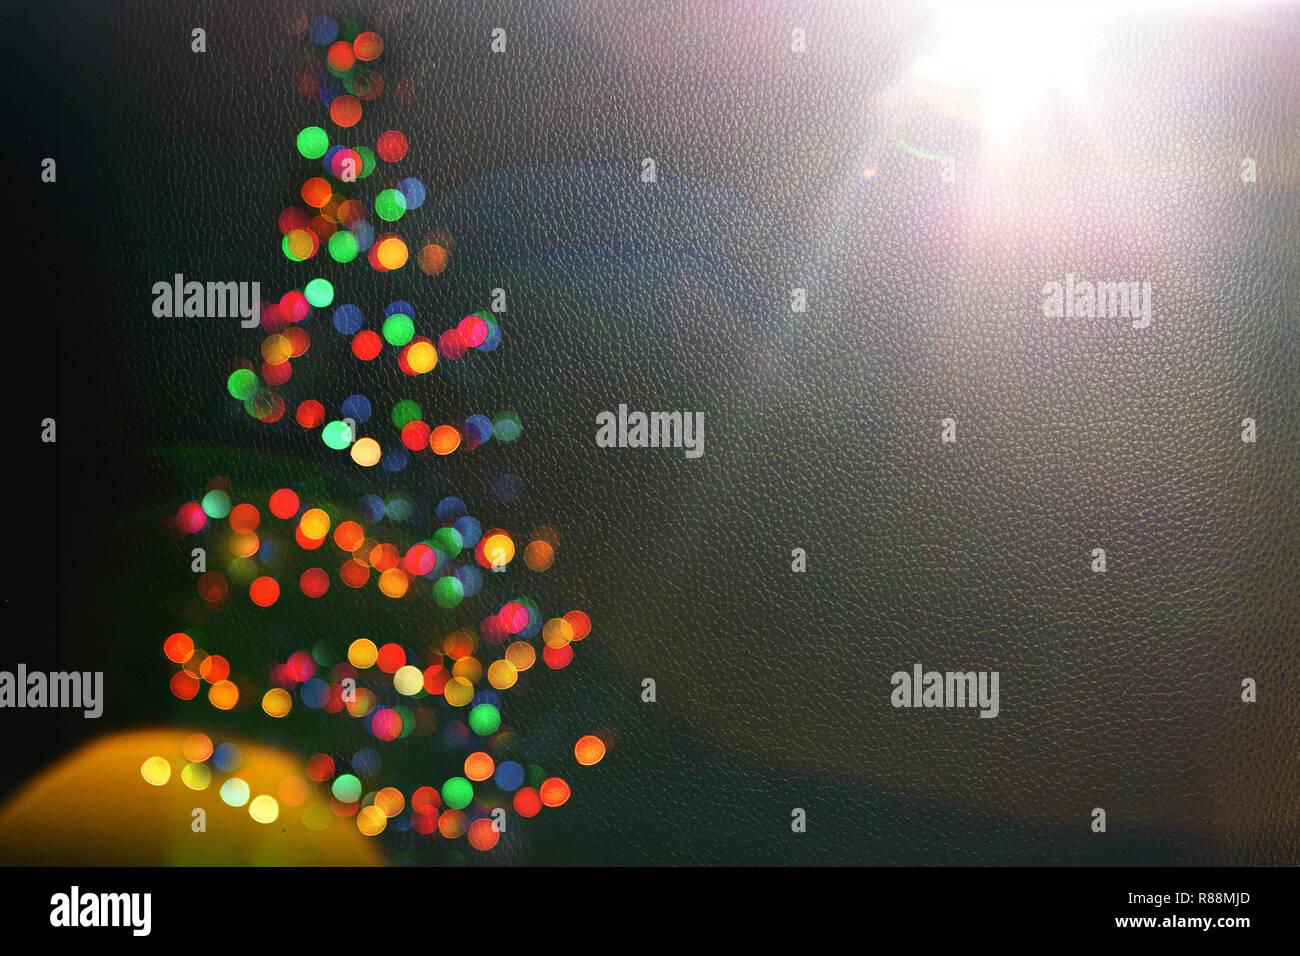 Bokeh silhouette of Christmas tree.blur light celebration on christmas tree on dark wall background. Abstract Christmas tree lights.Winter holidays greeting card.fairy lights.Copy space - Stock Image